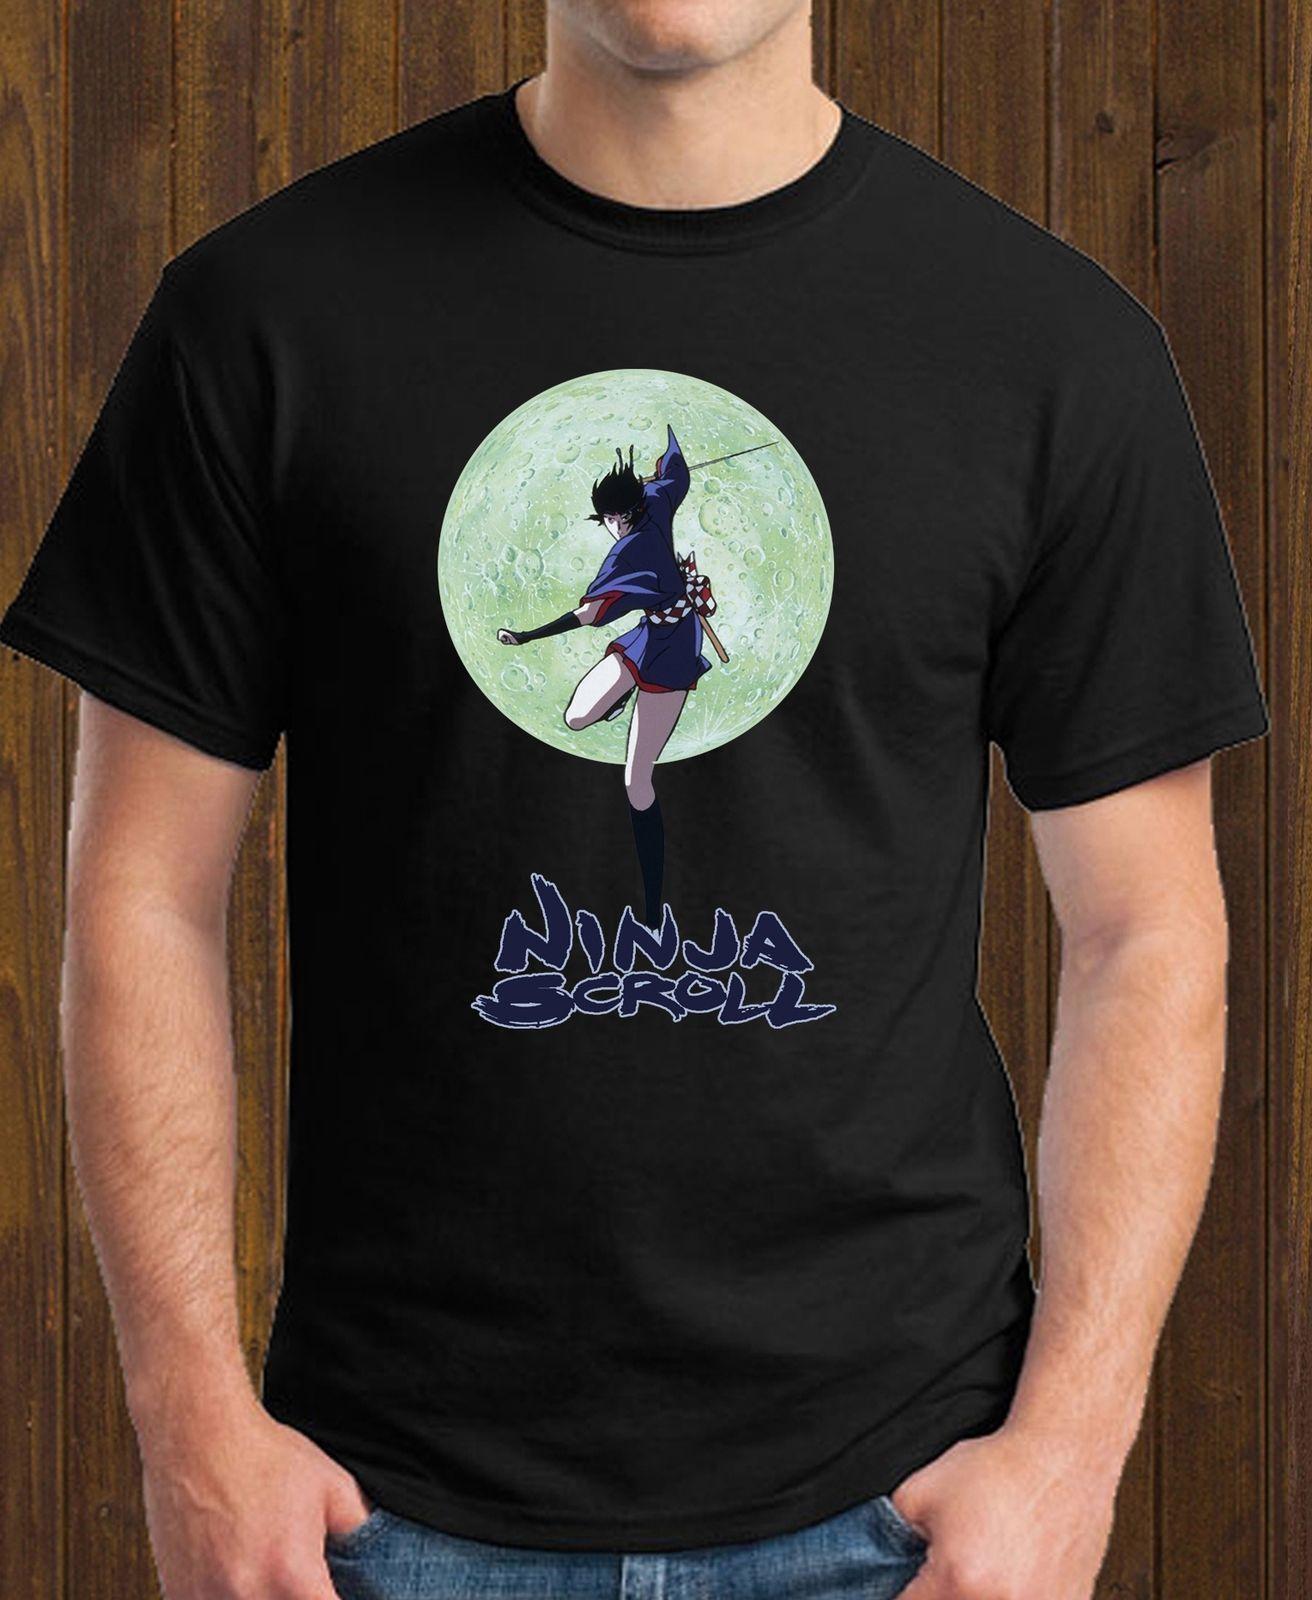 a24f1aad96 Compre Ninja Rolo Kagero Lua Jubei Anime Manga Preto T Shirt Engraçado  Frete Grátis Unisex Casual Tshirt Top De Thebestoree